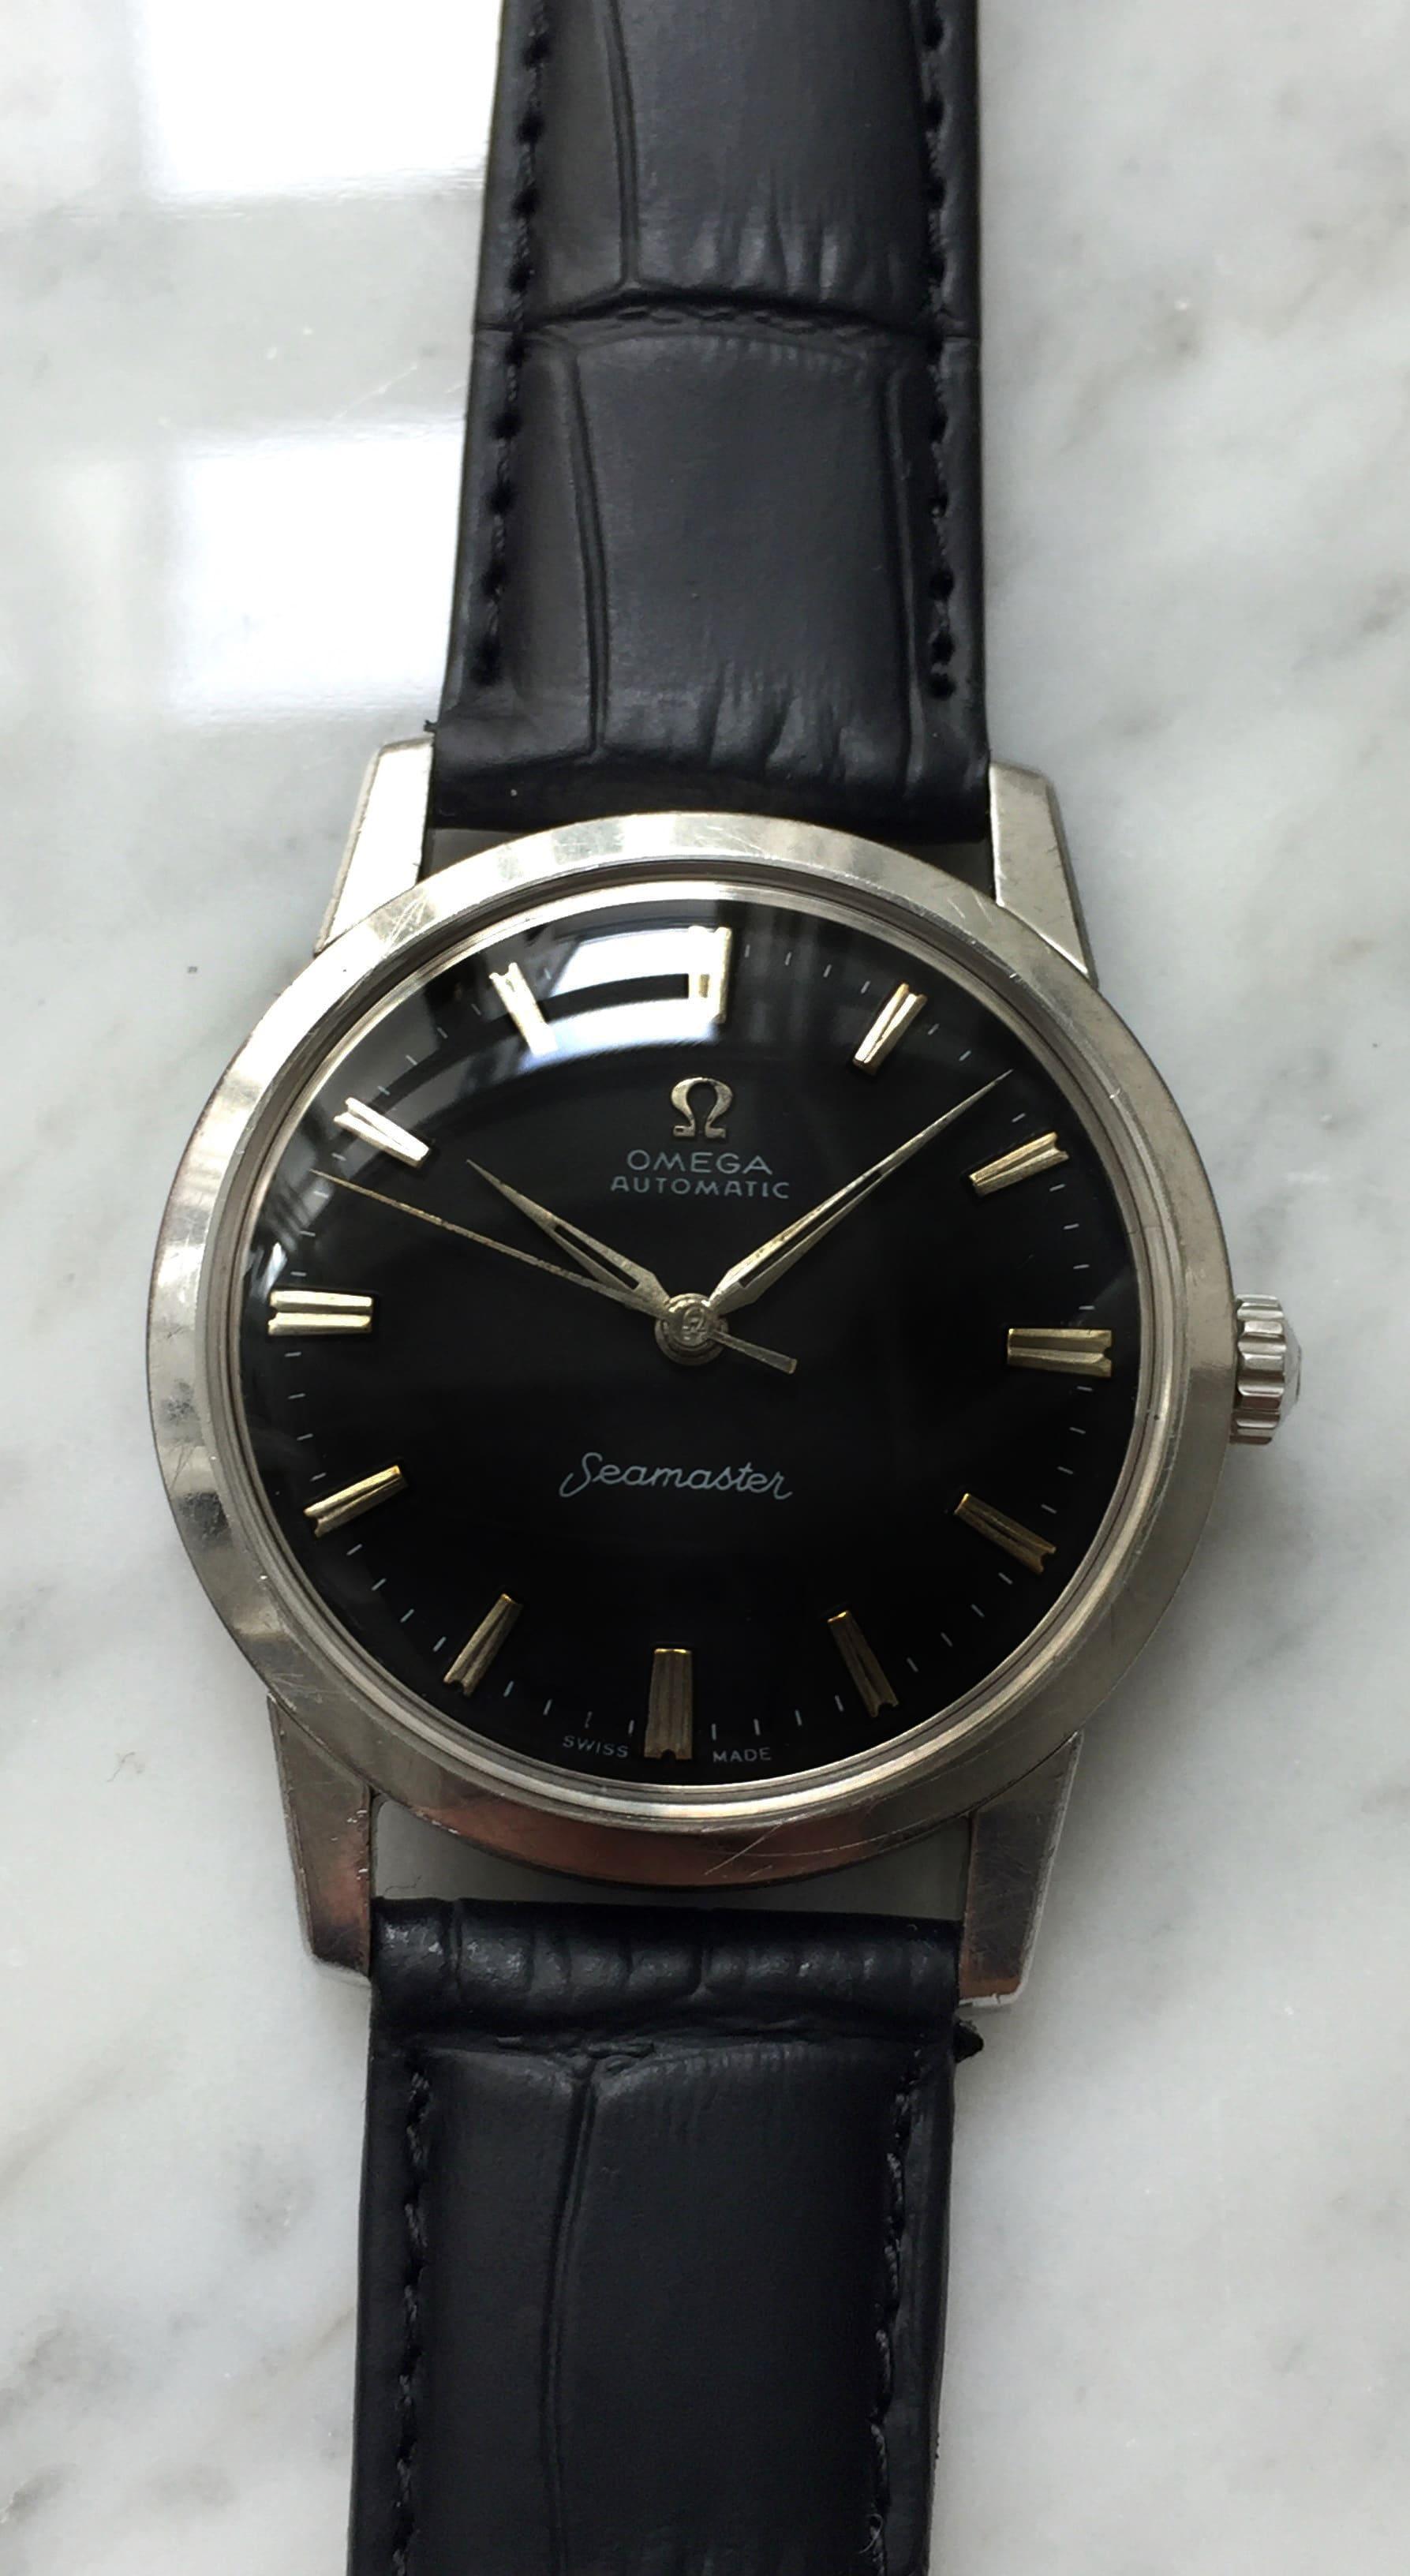 Vintage Omega Seamaster Automatic Refurbished Black Dial